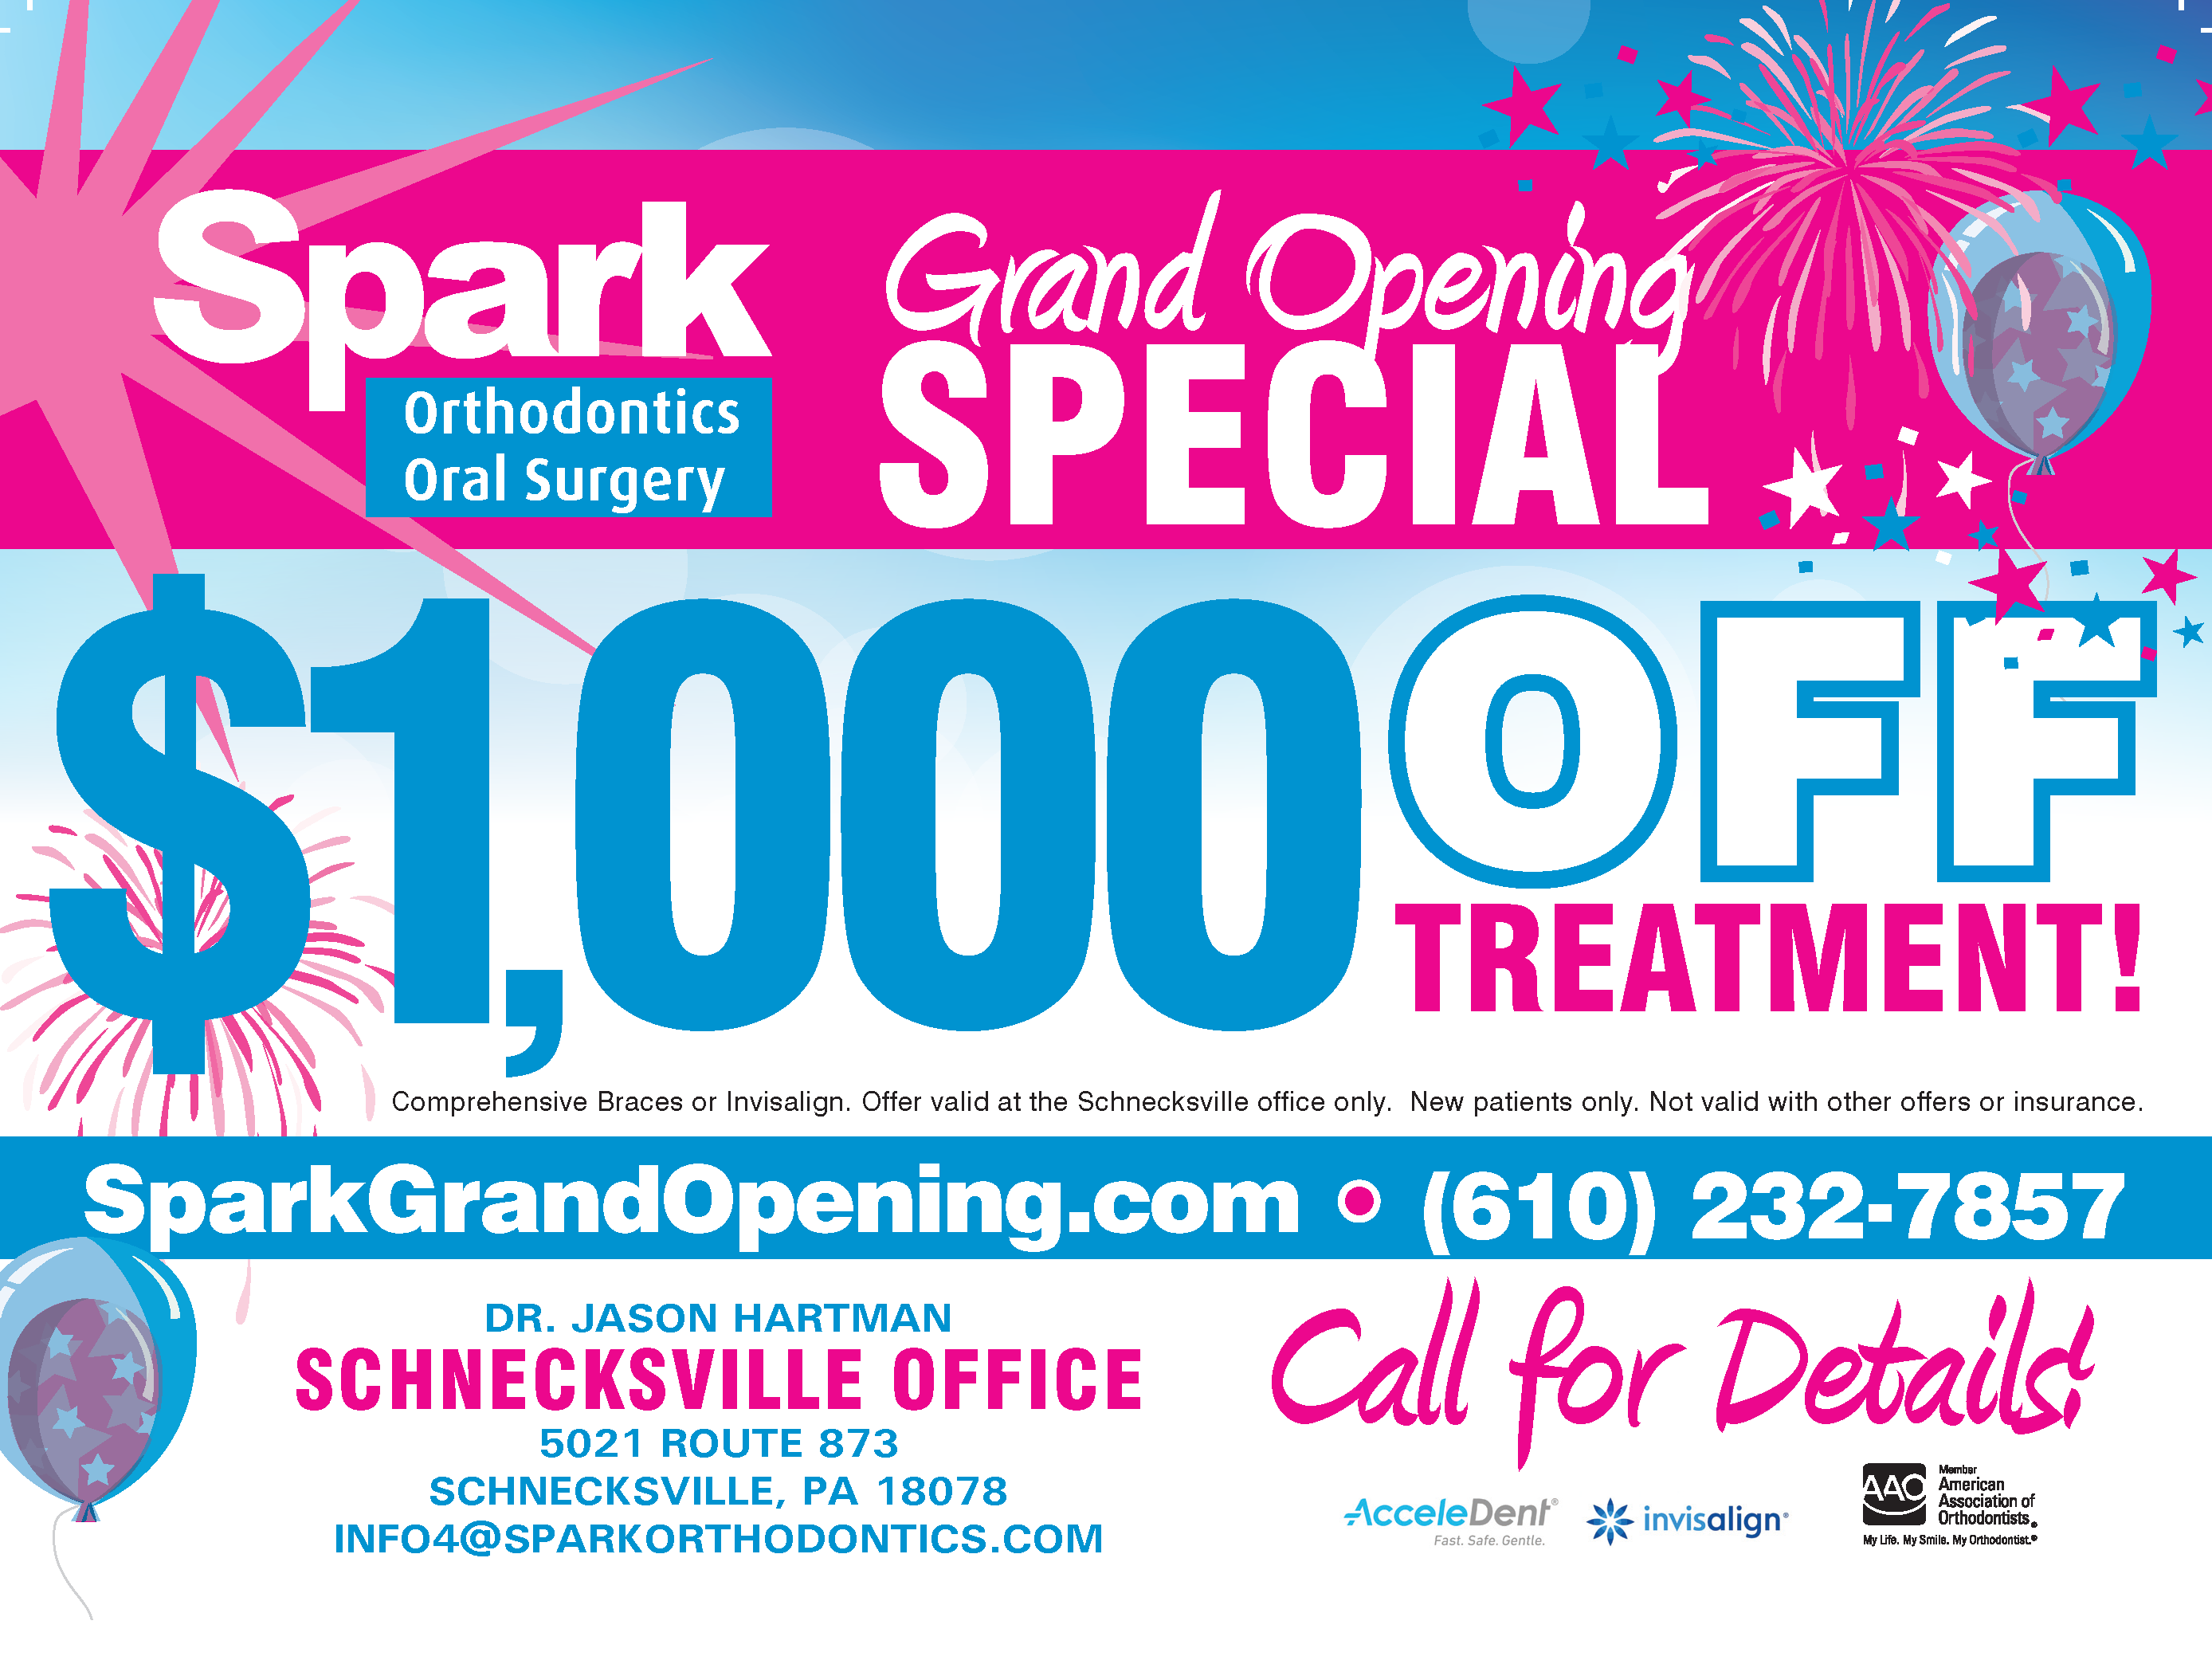 spark orthodontics grand opening